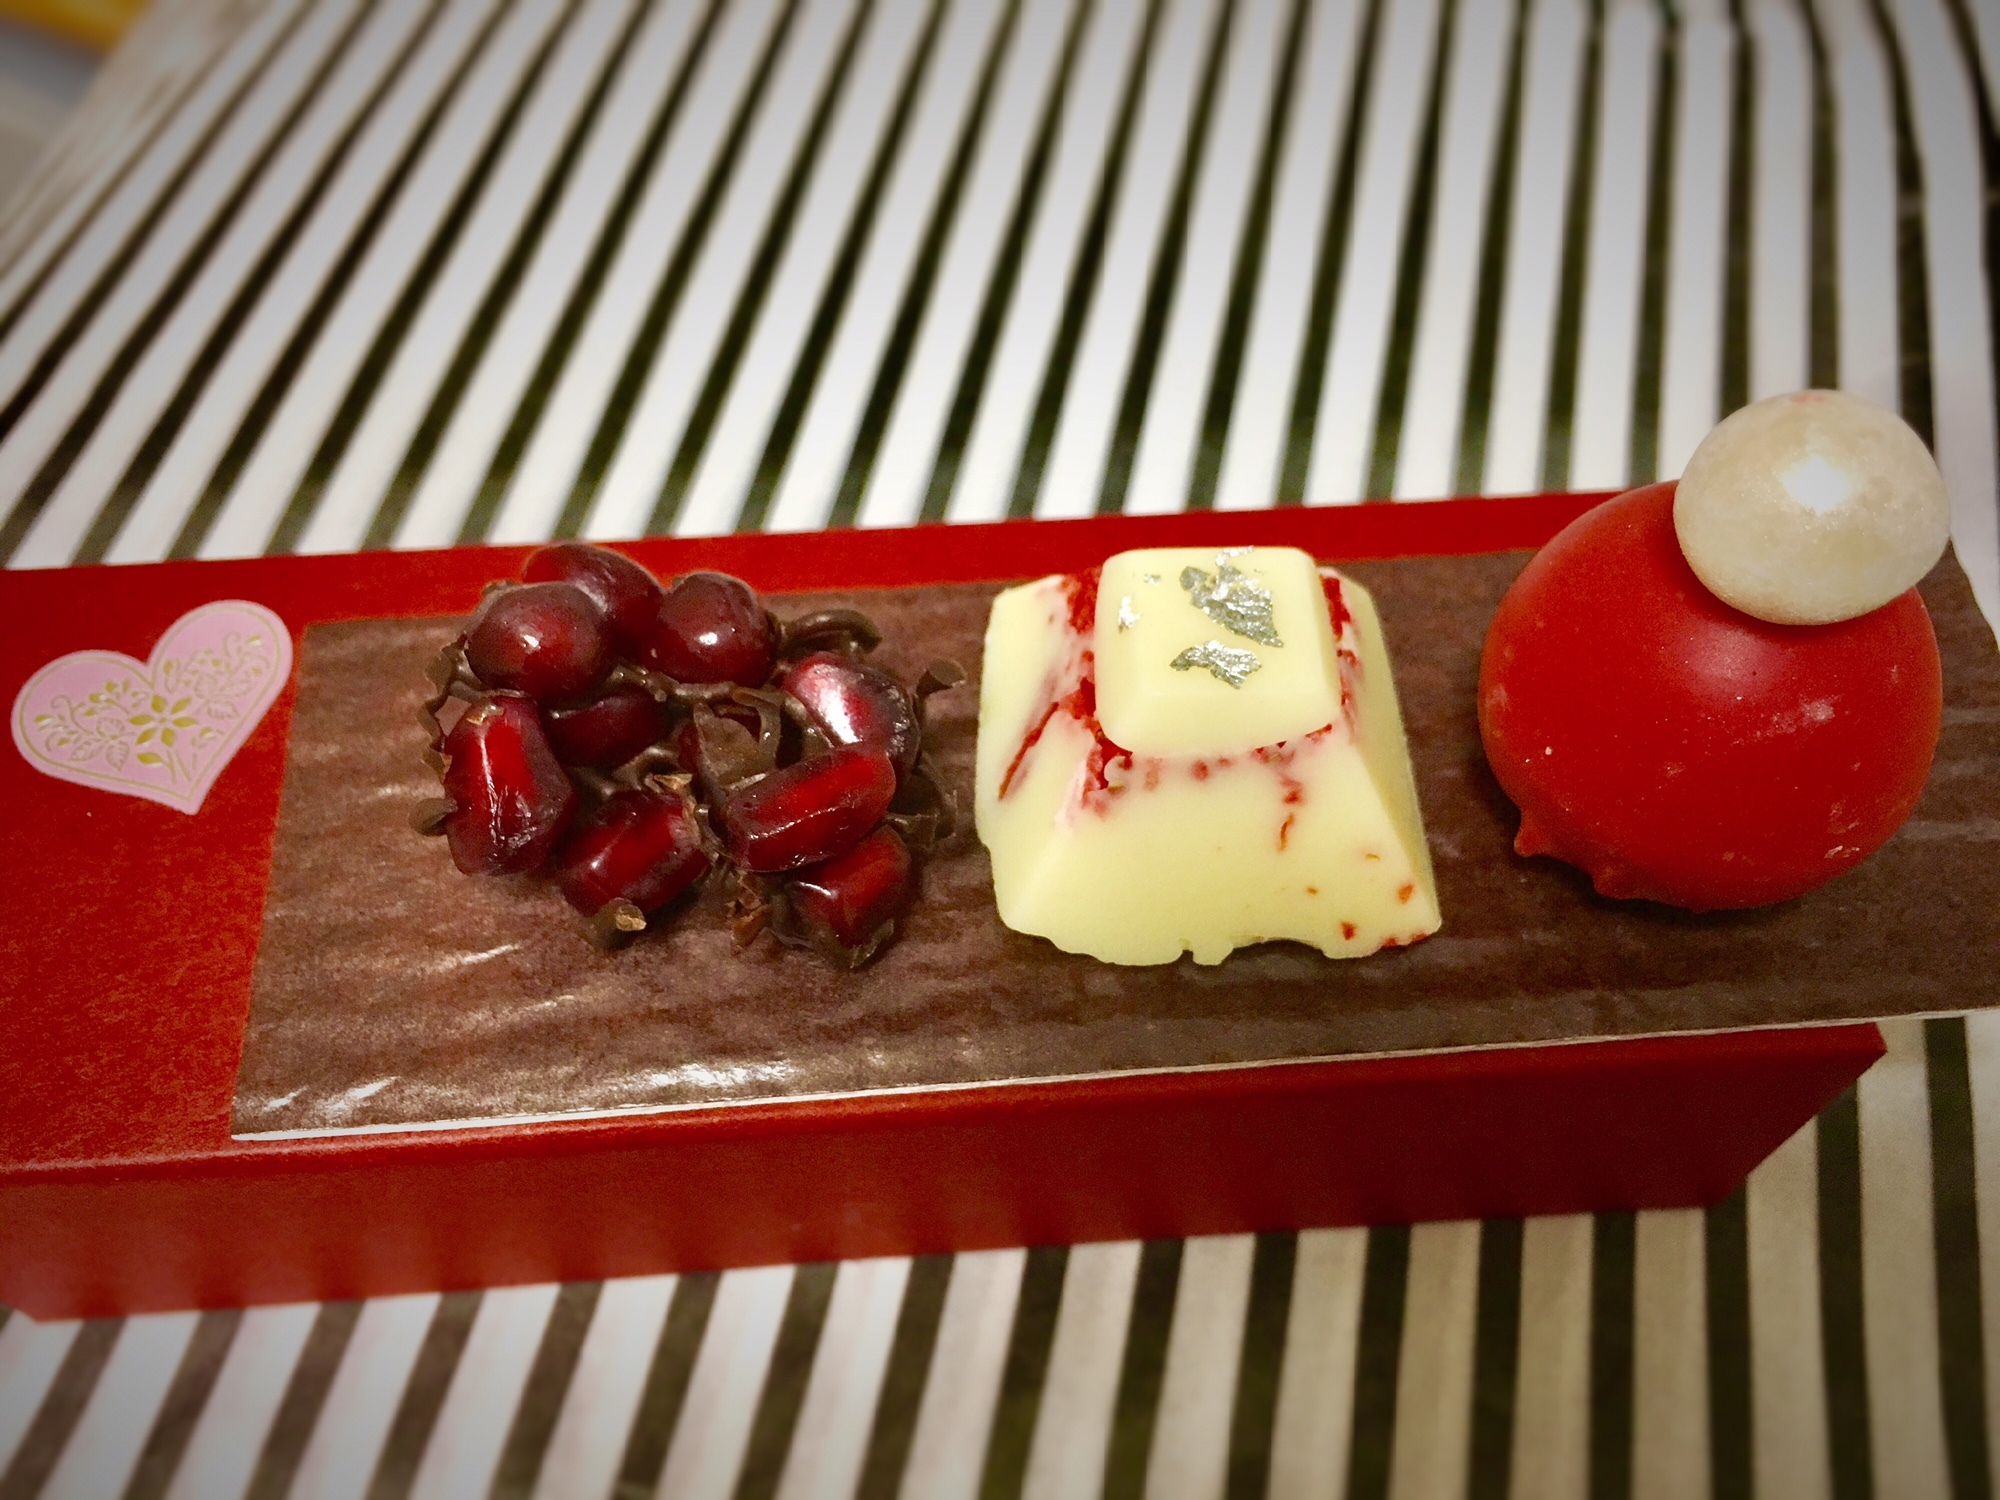 HAPPY VALENTINE ❤︎ バレンタイン・イヴにアスタリフトの新製品先行体験イベントへ行ってきました❤︎_1_4